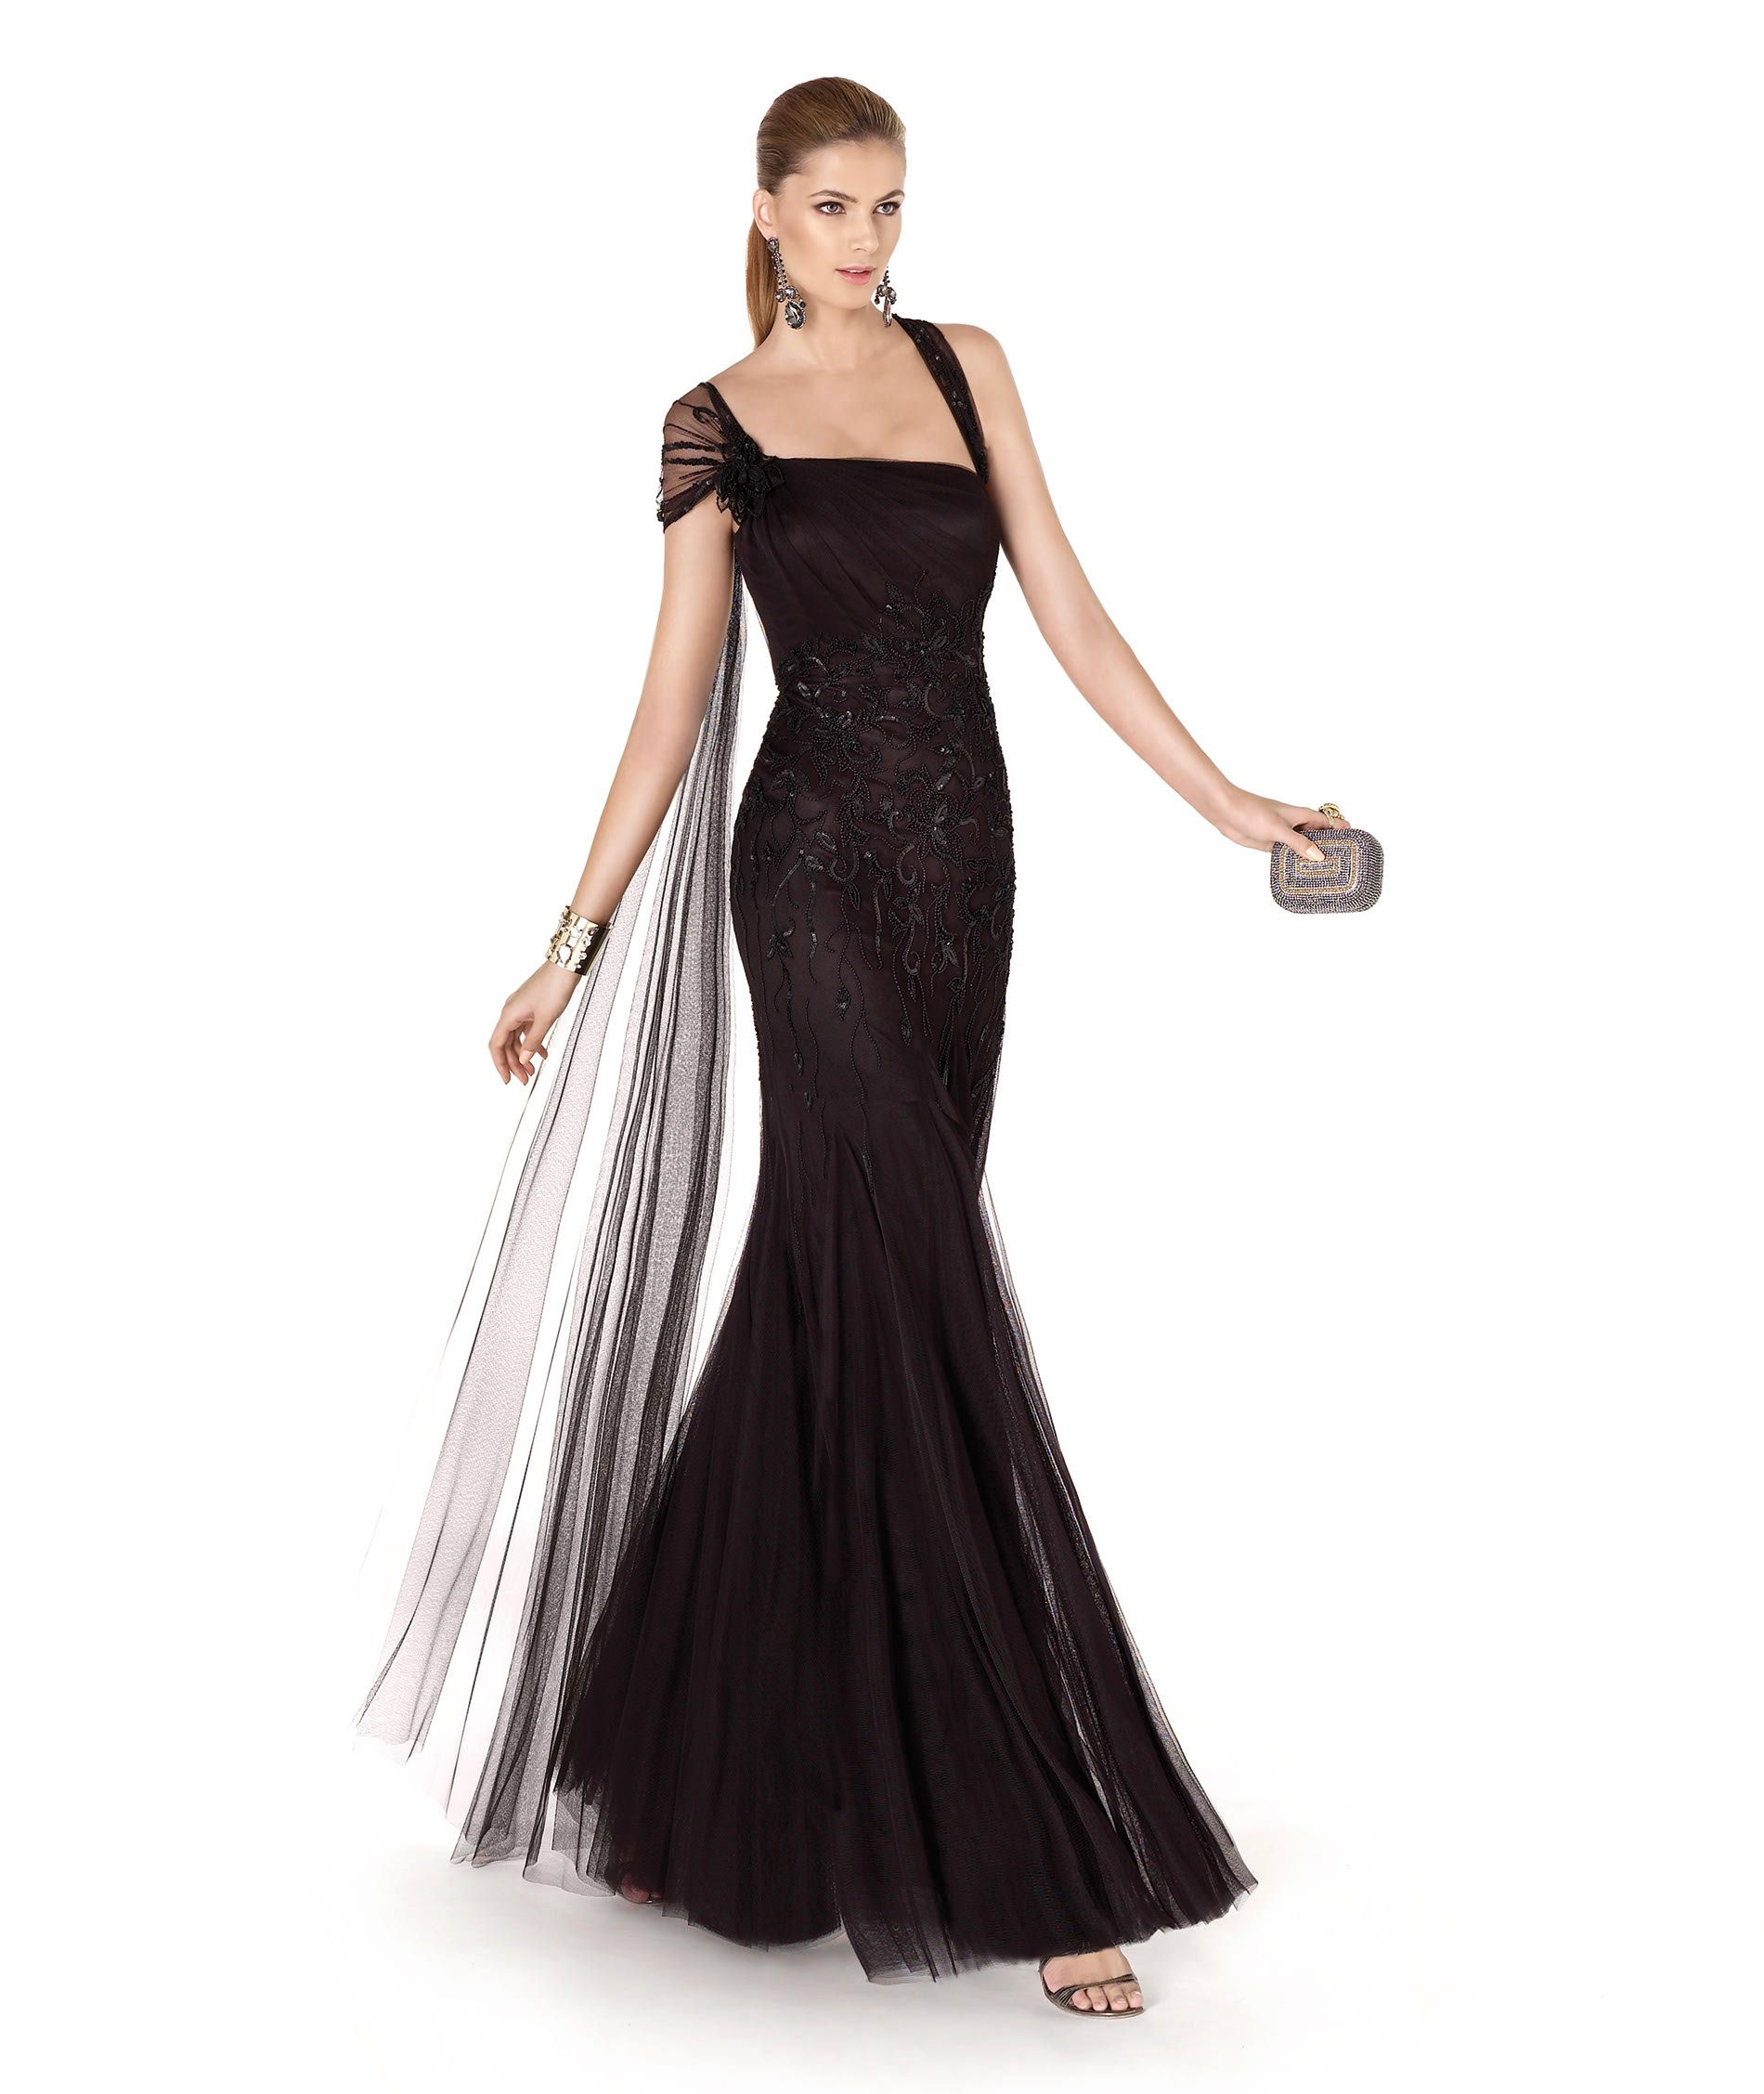 pronovias style adelma cocktail dresses pronovias adelma